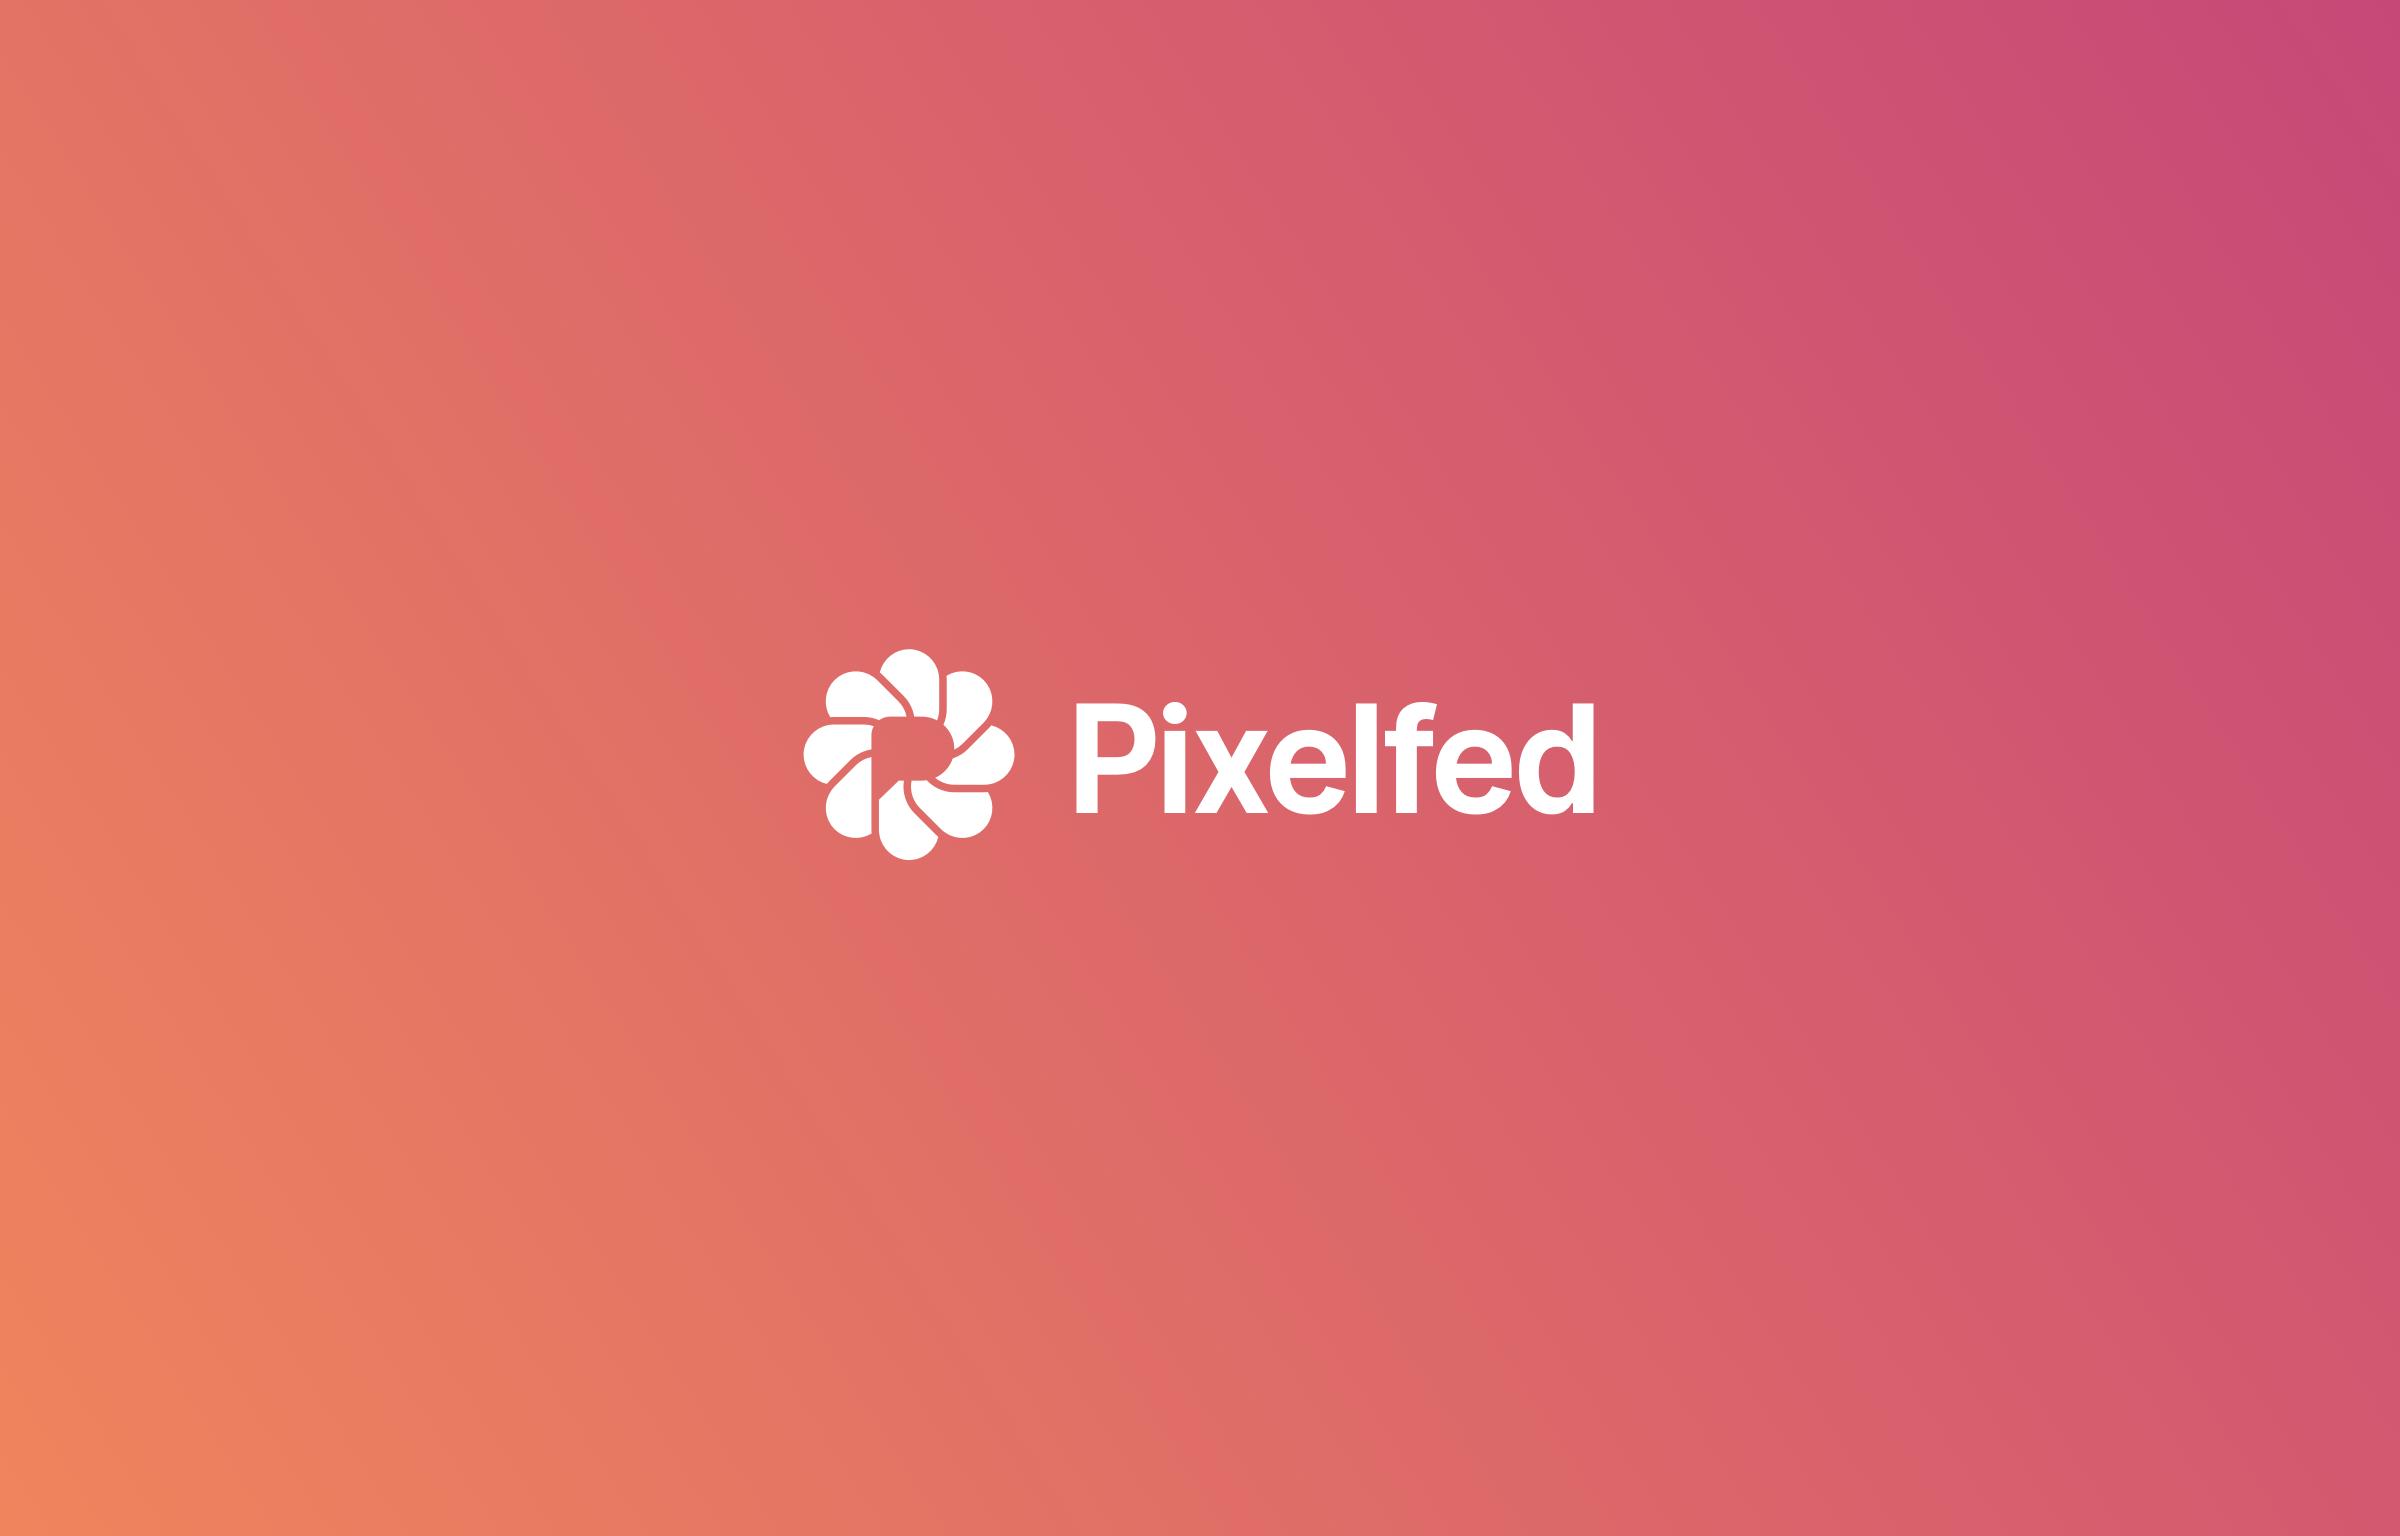 Pixelfed - big inverted